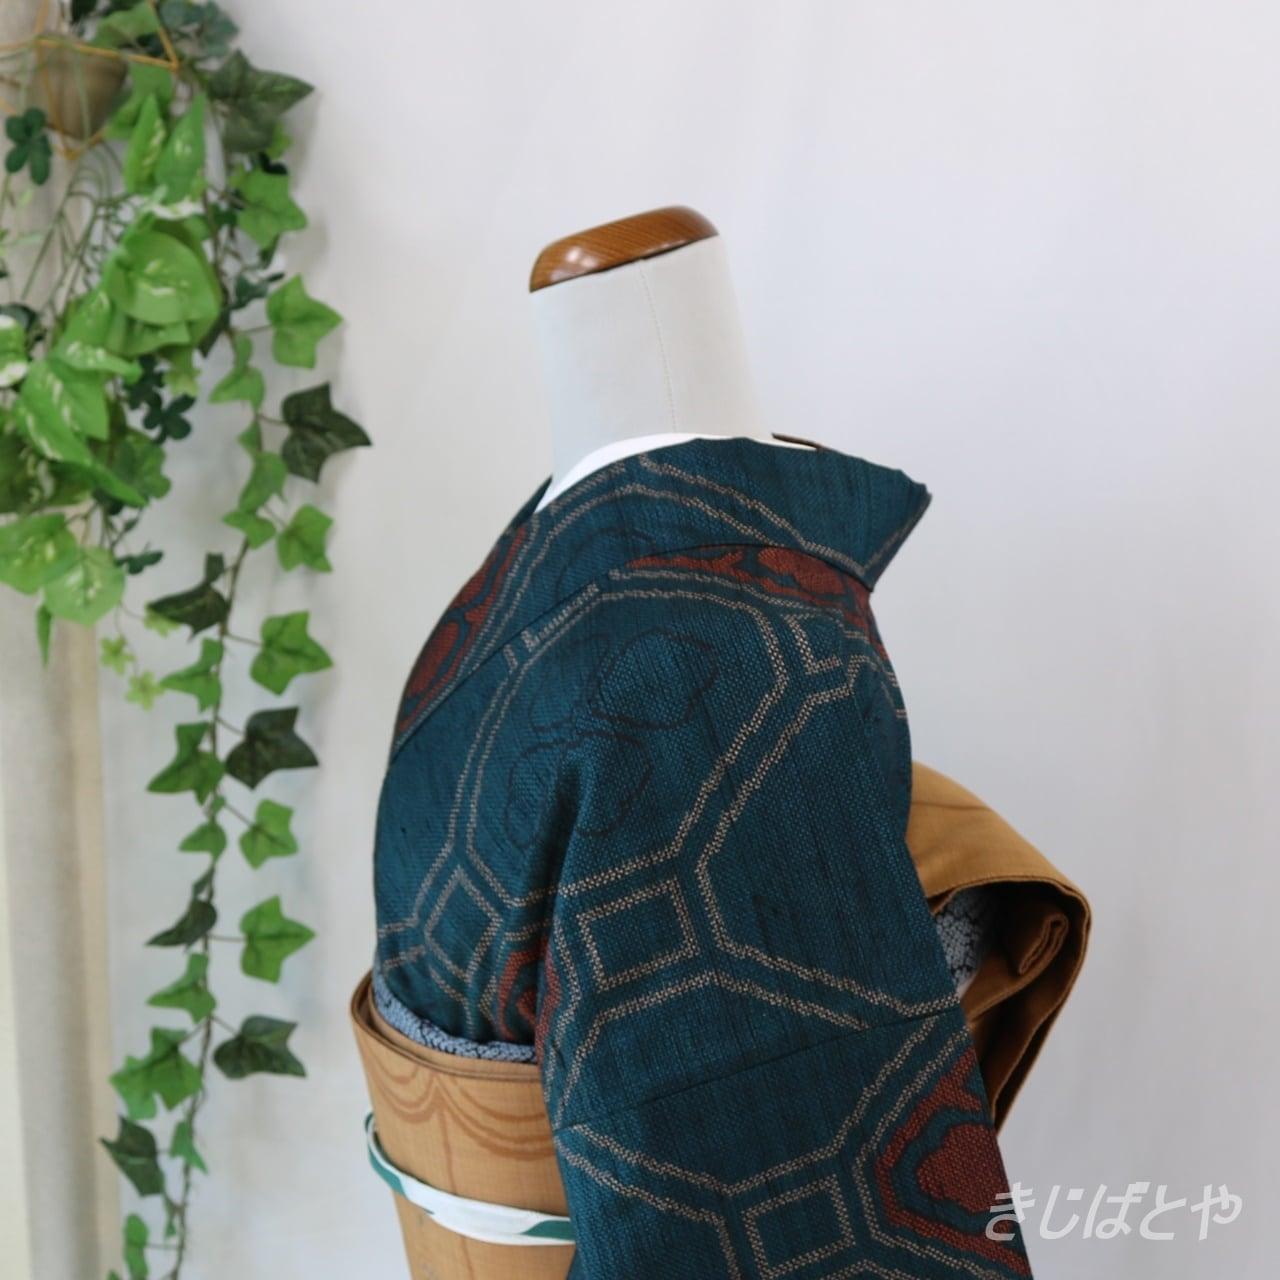 正絹紬 御納戸色に蜀江文様の小紋 袷